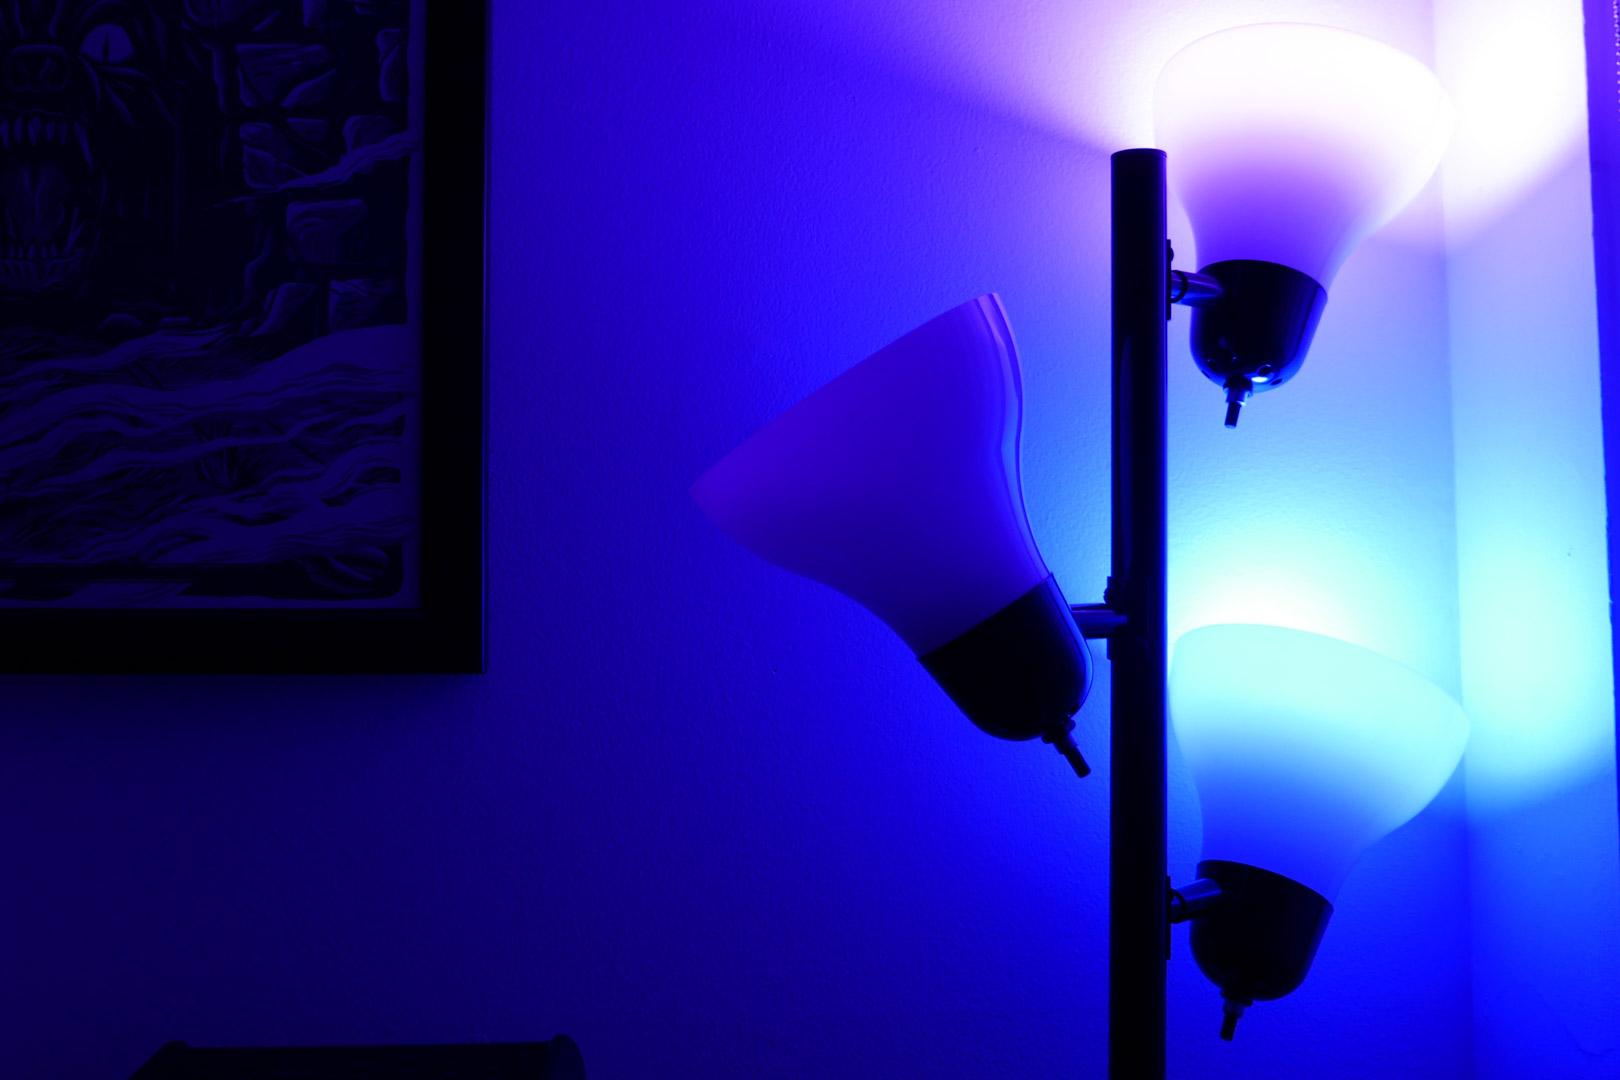 LIFX LED Smart Lightbulb